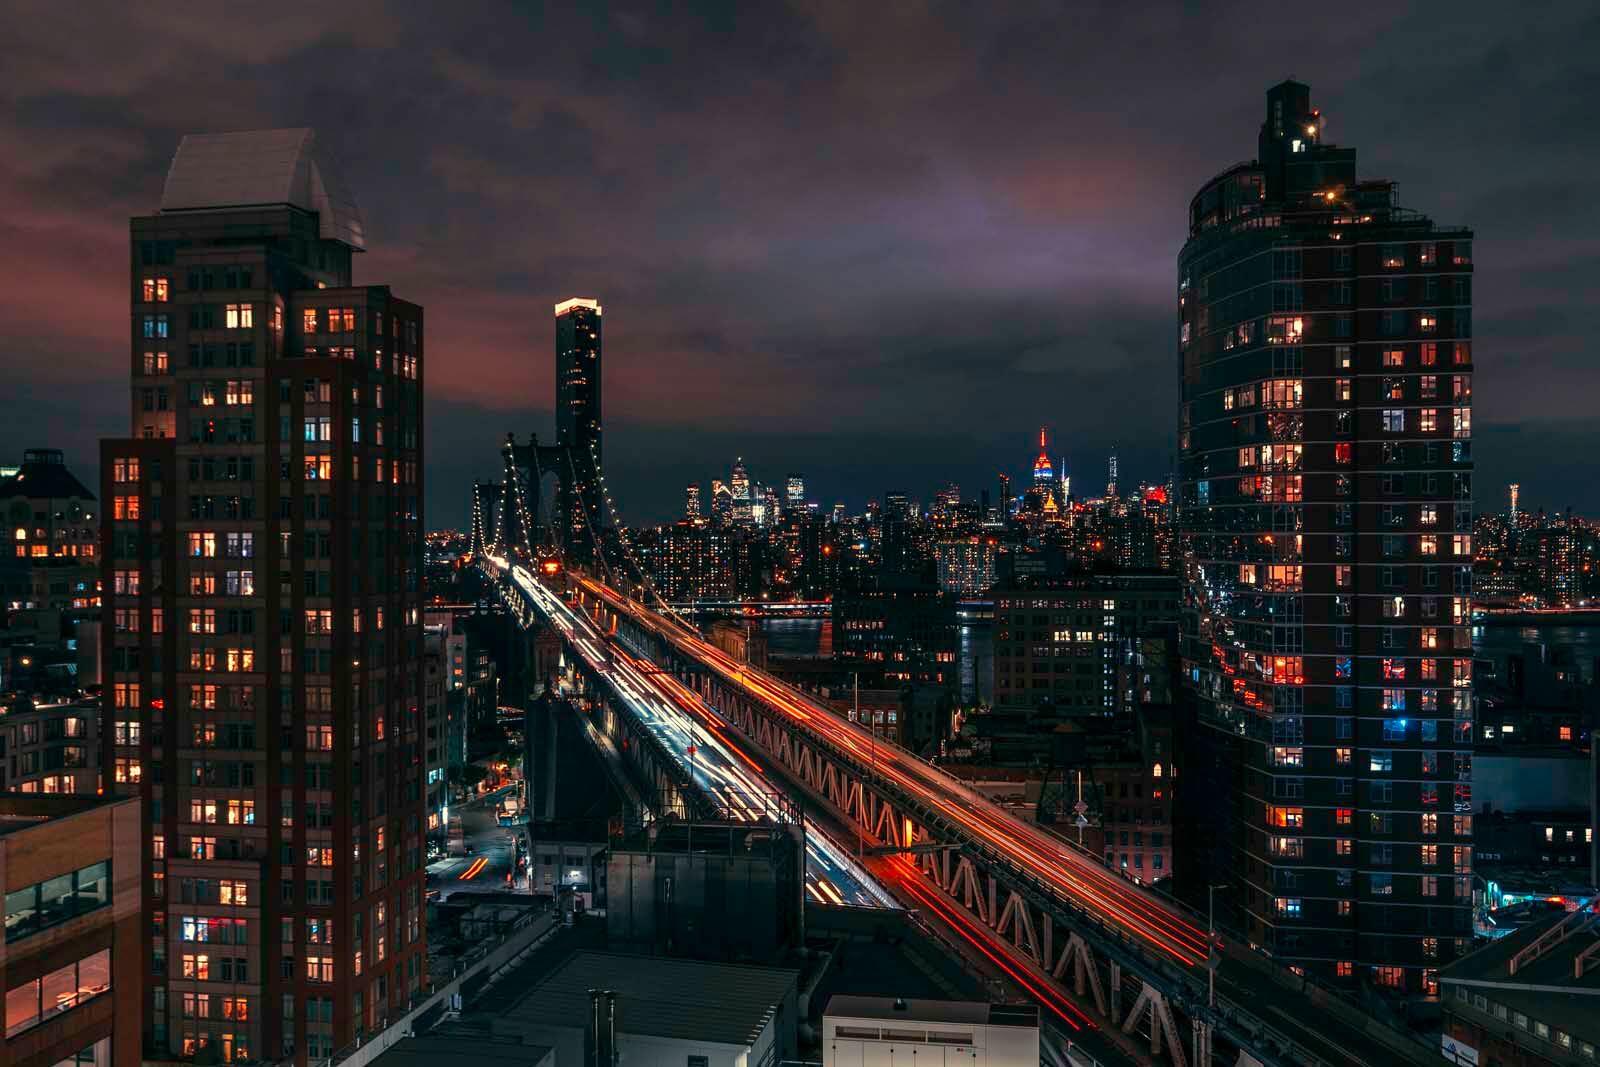 Randolph Beer rooftop view in DUMBO of the Manhattan Bridge in Brooklyn